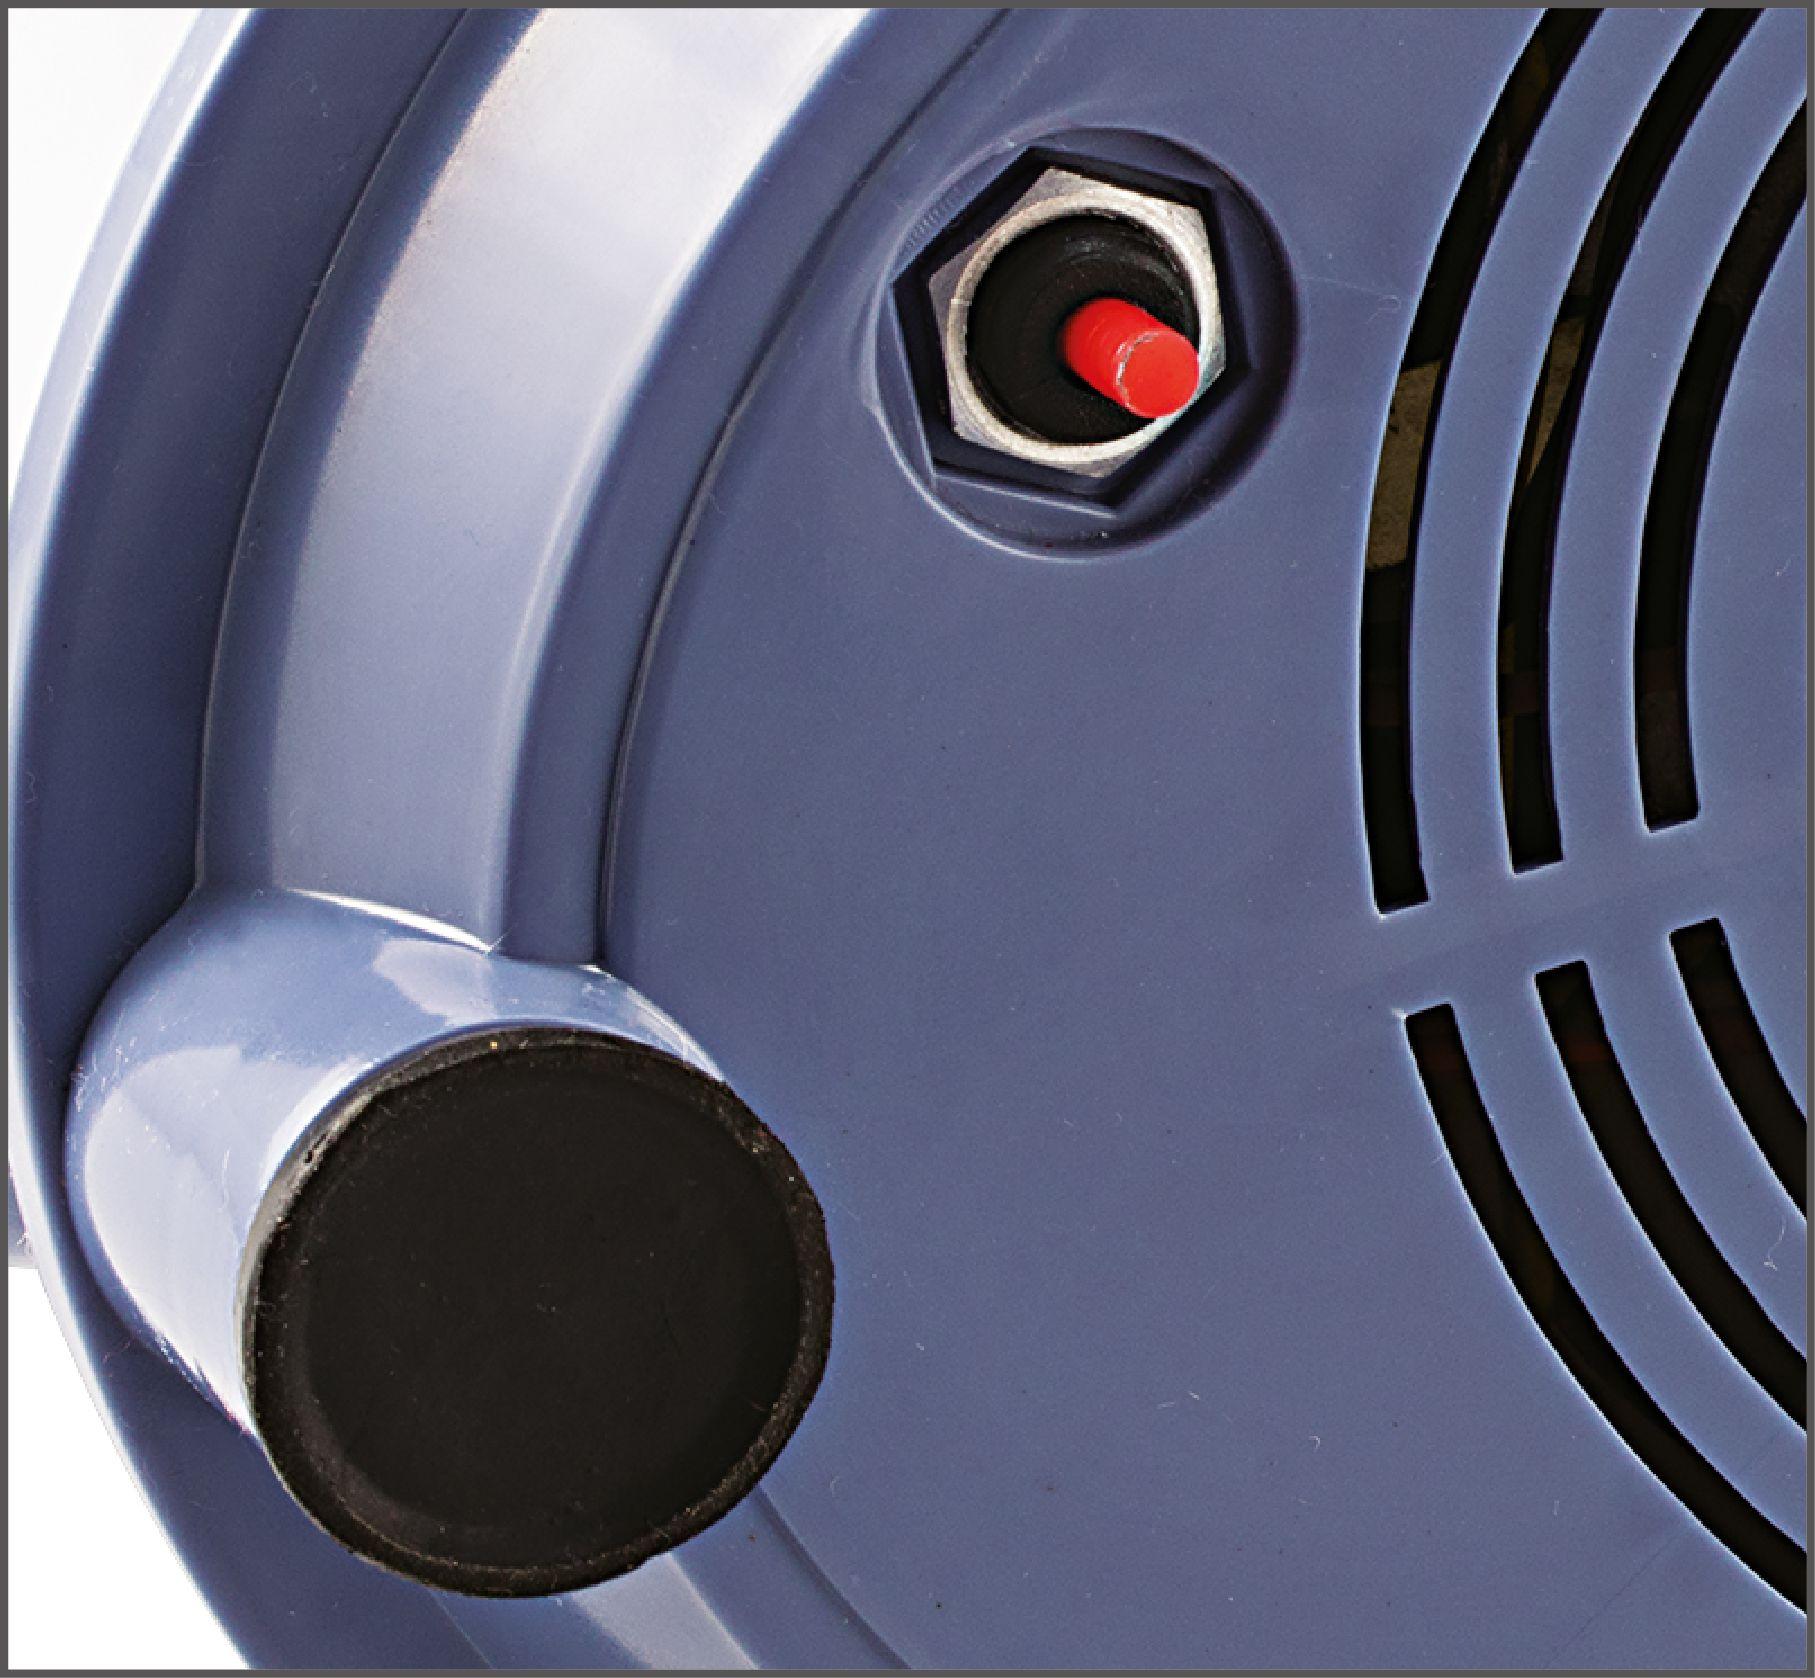 eveready glowy 3 jar 500 watt mixer grinder price in india